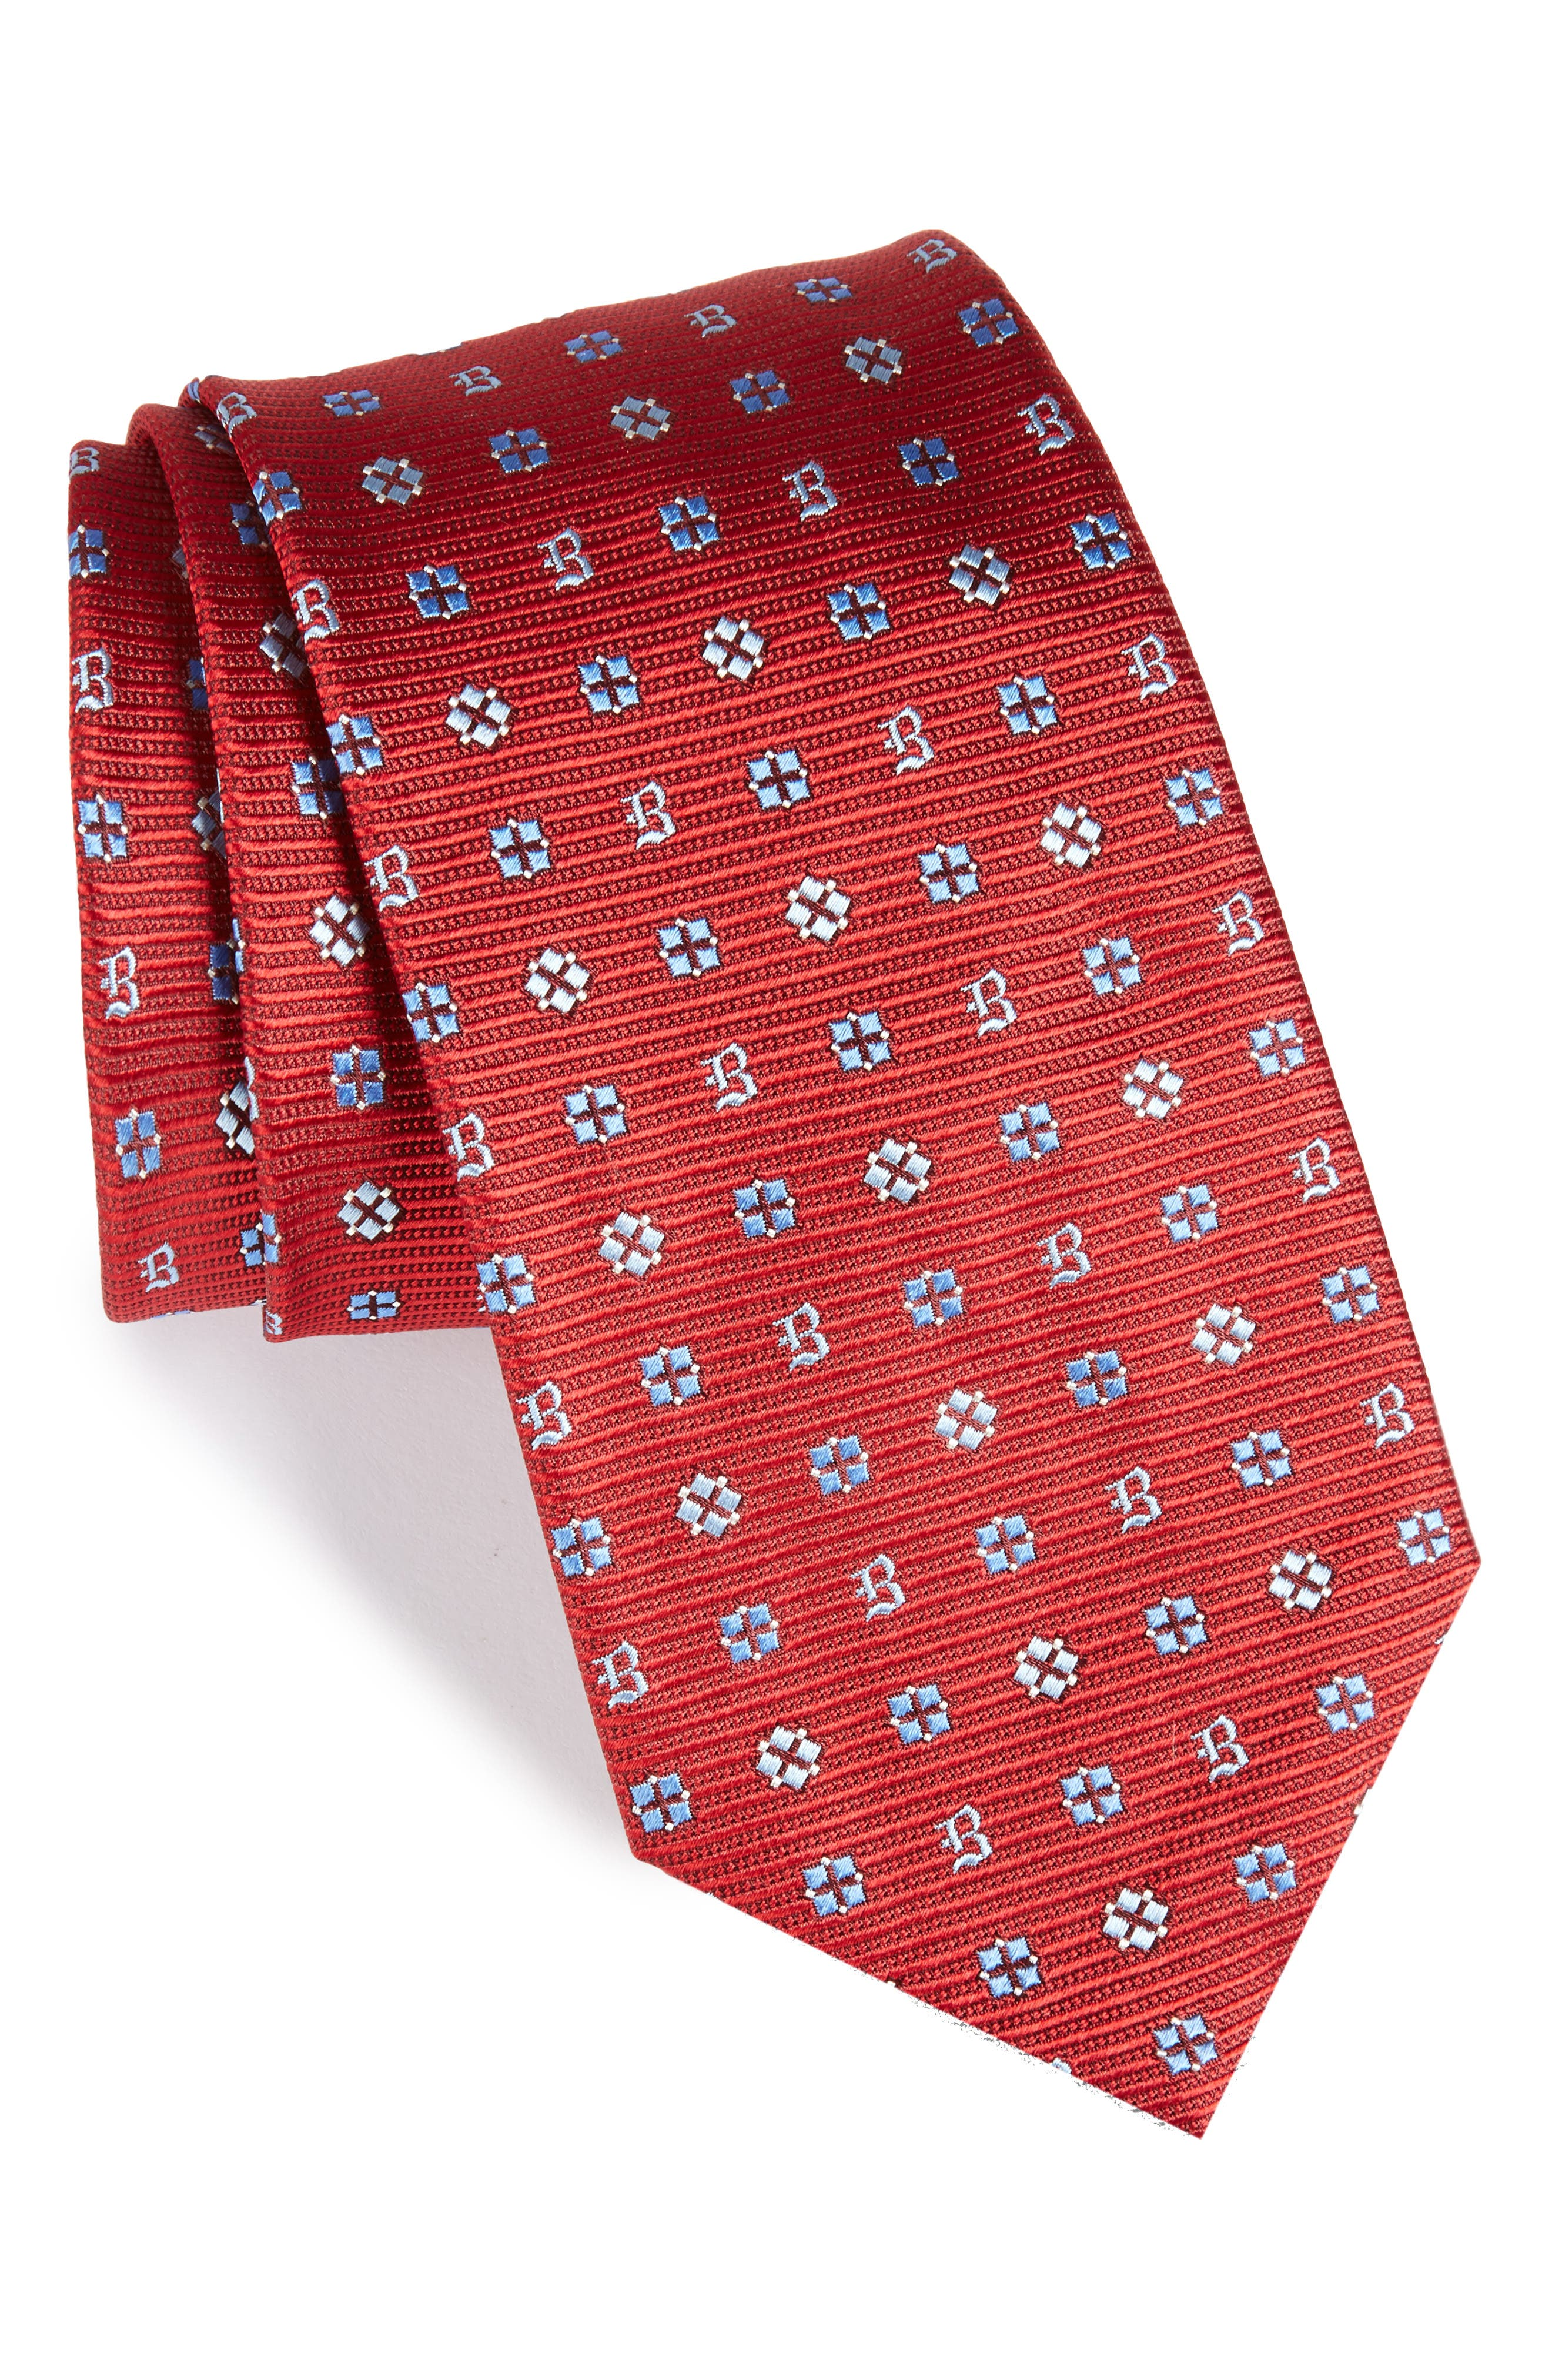 Main Image - Brioni Medallion Silk Tie